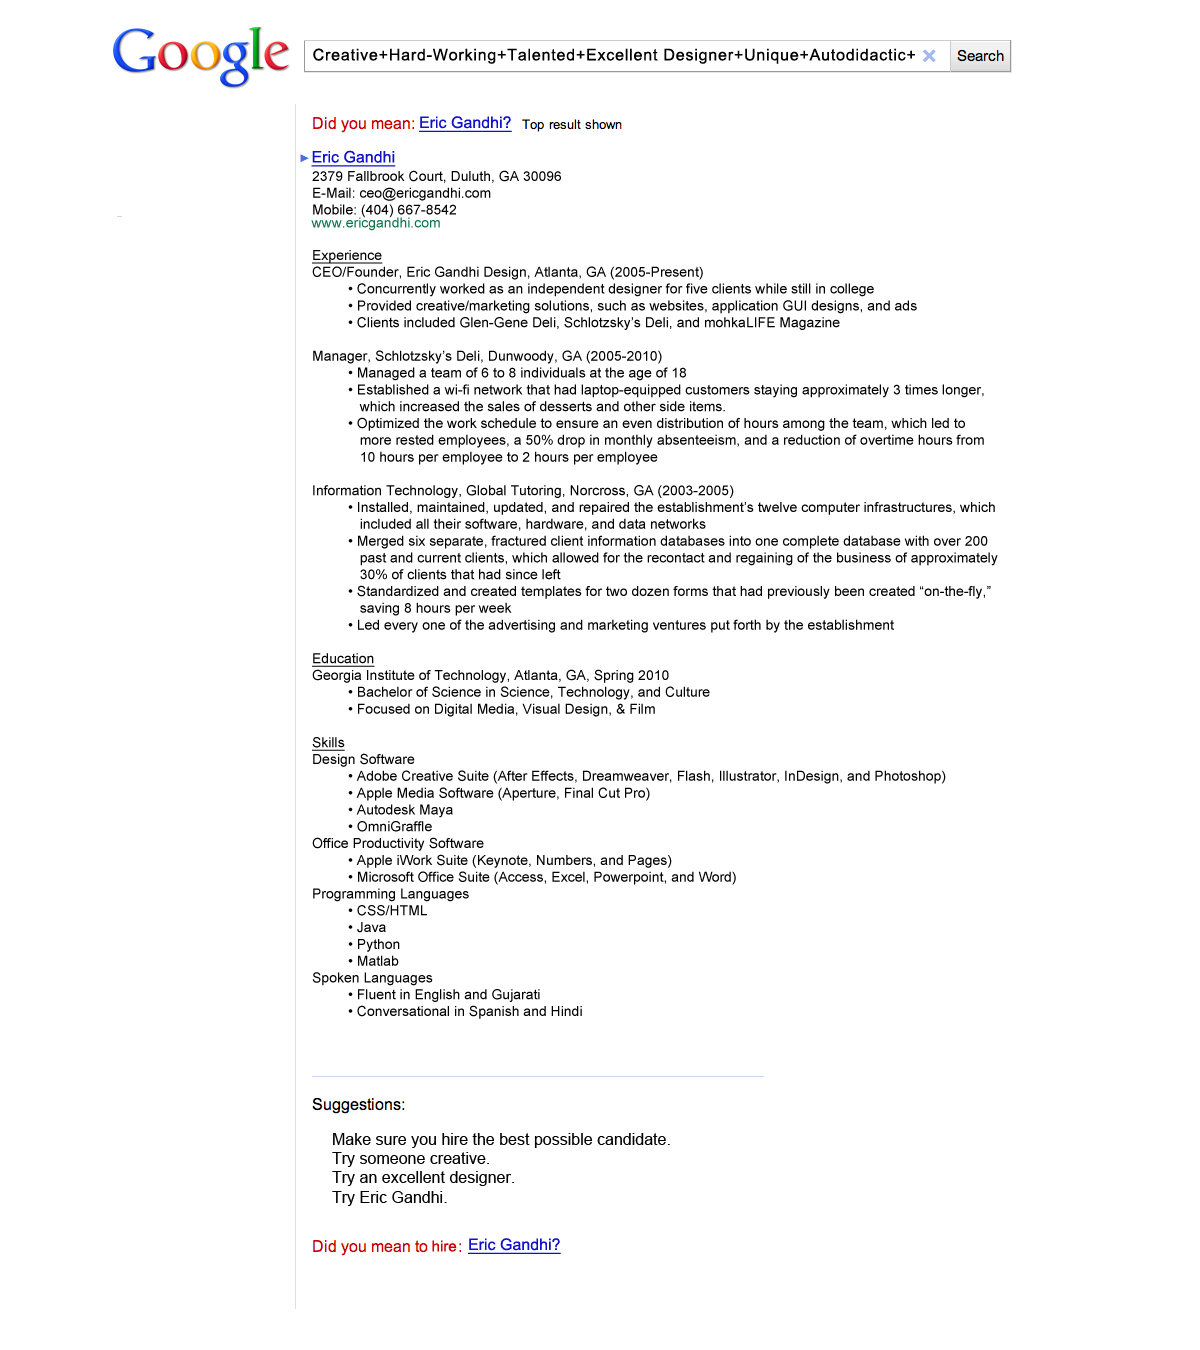 google-resume3